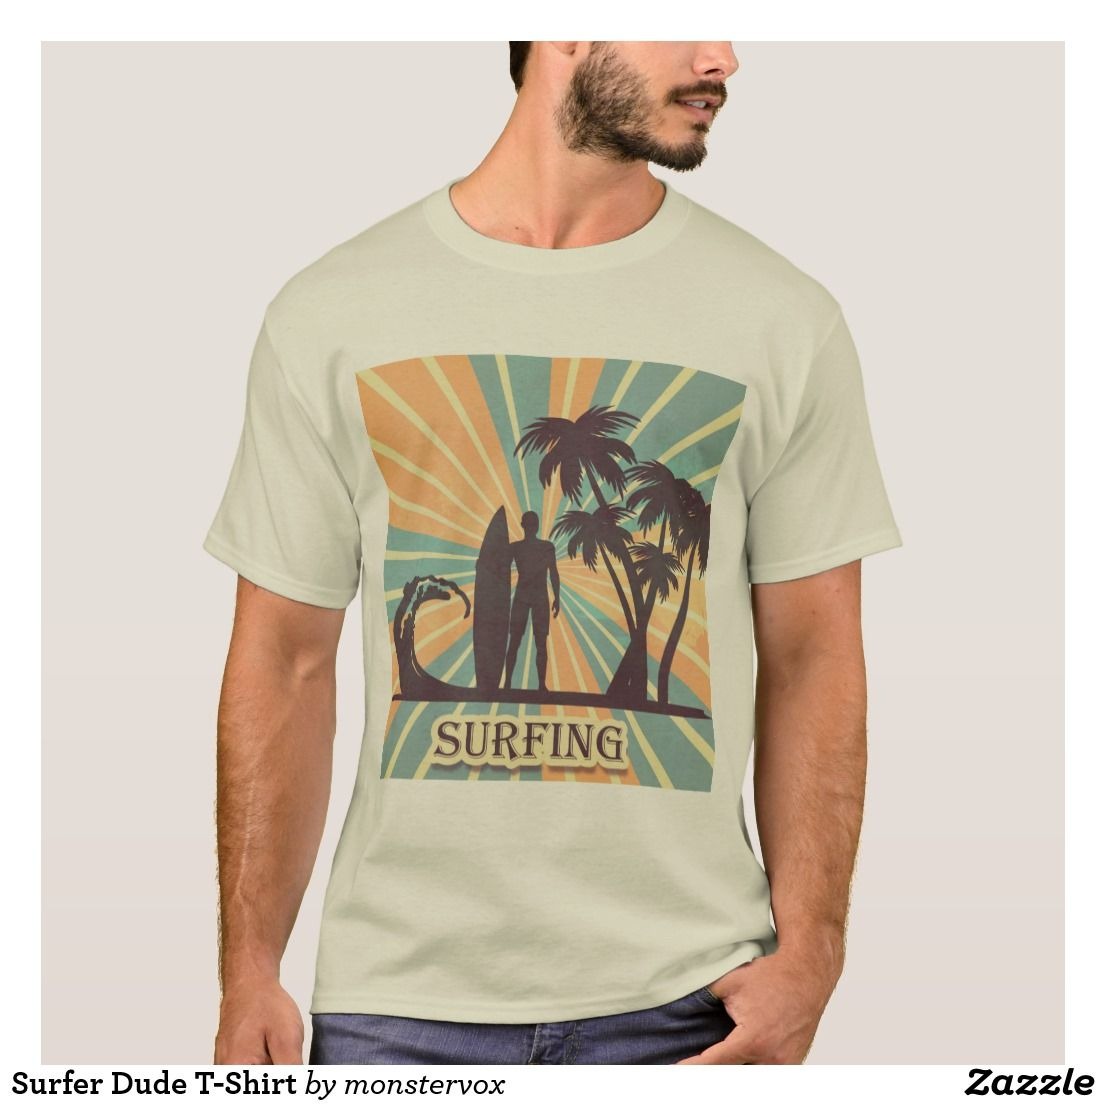 Surfer Dude T Shirt Zazzle Com In 2021 T Shirt Surfer Dude Shirts